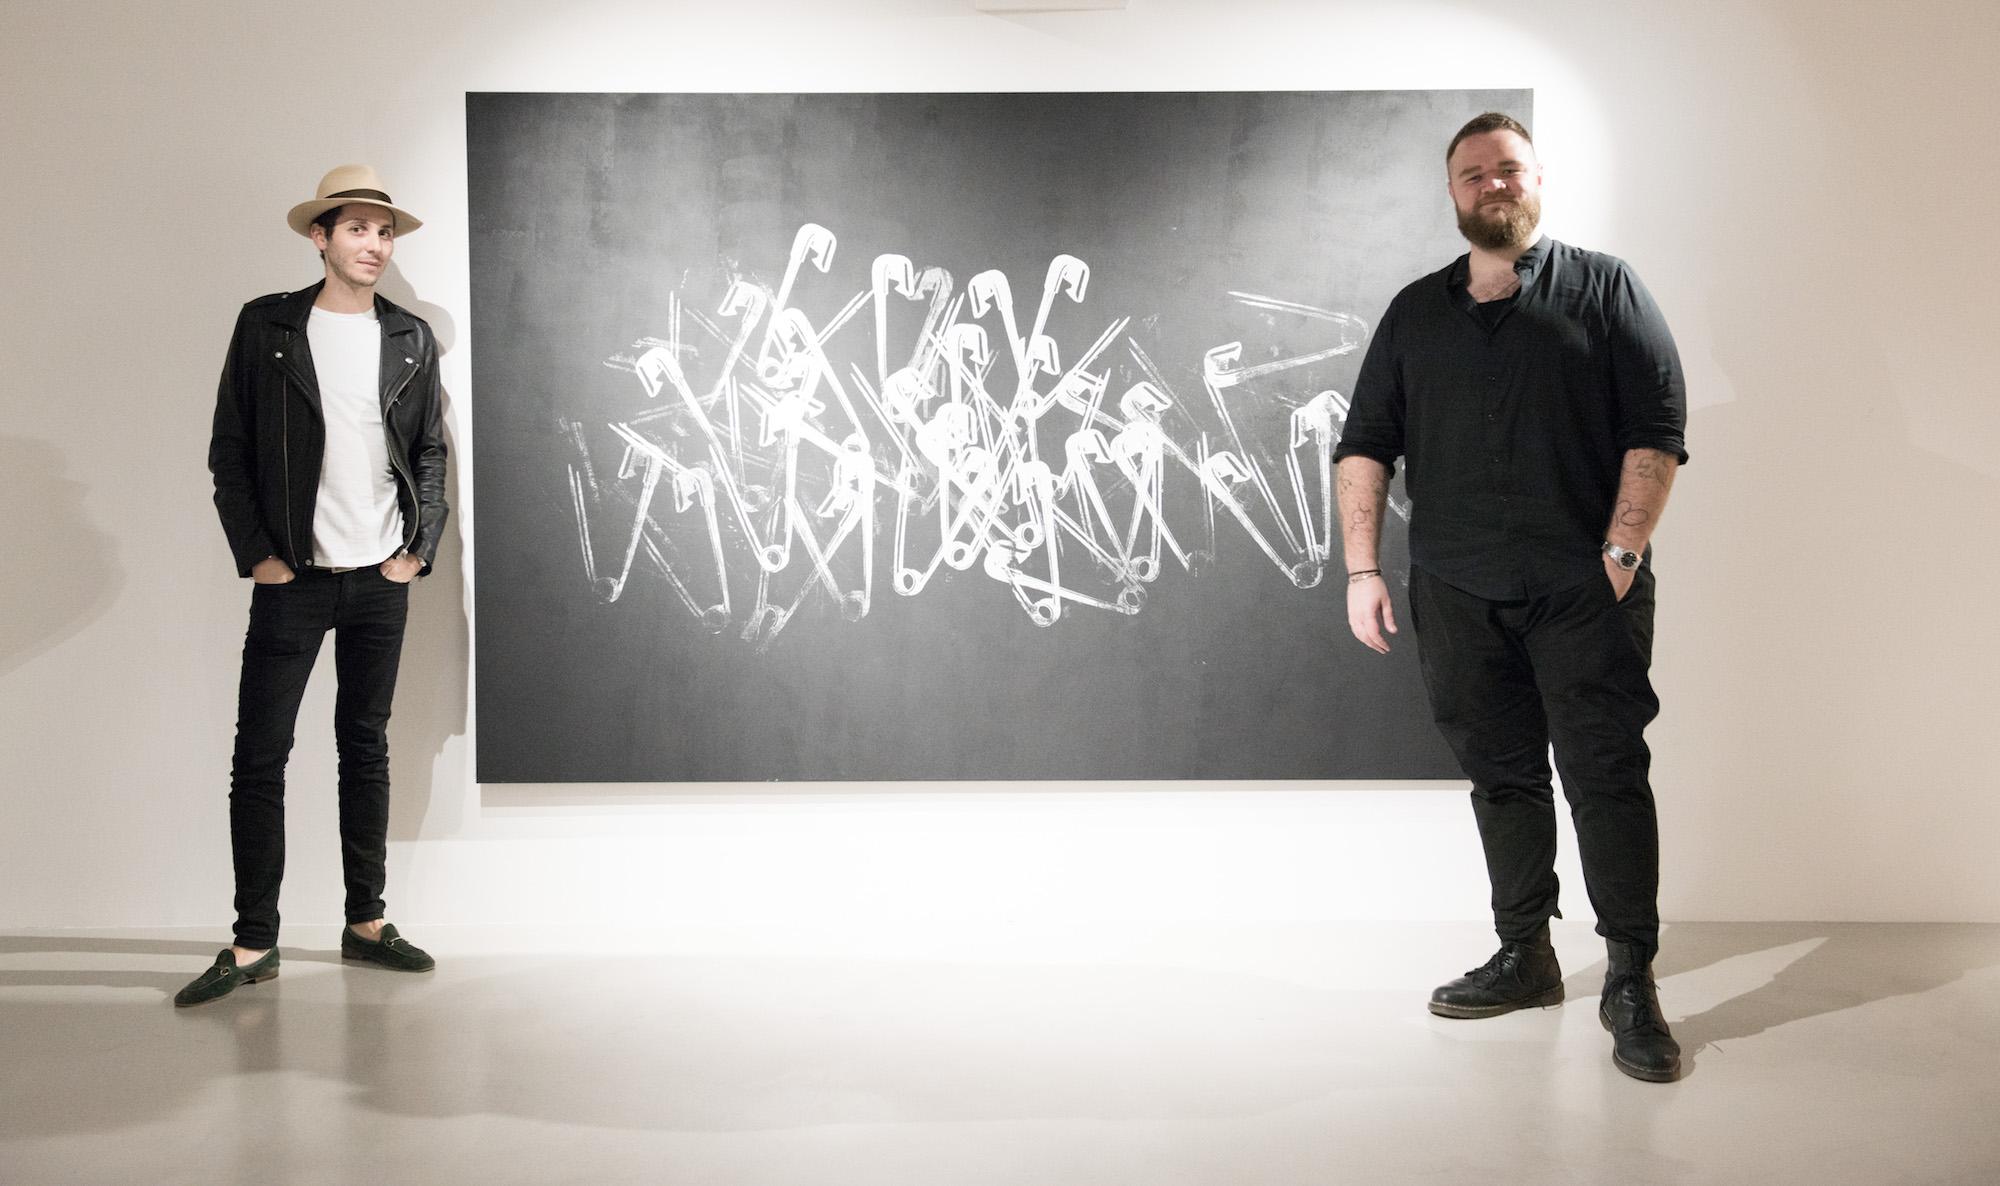 Greg McNamara, Nick Koenighsknecht